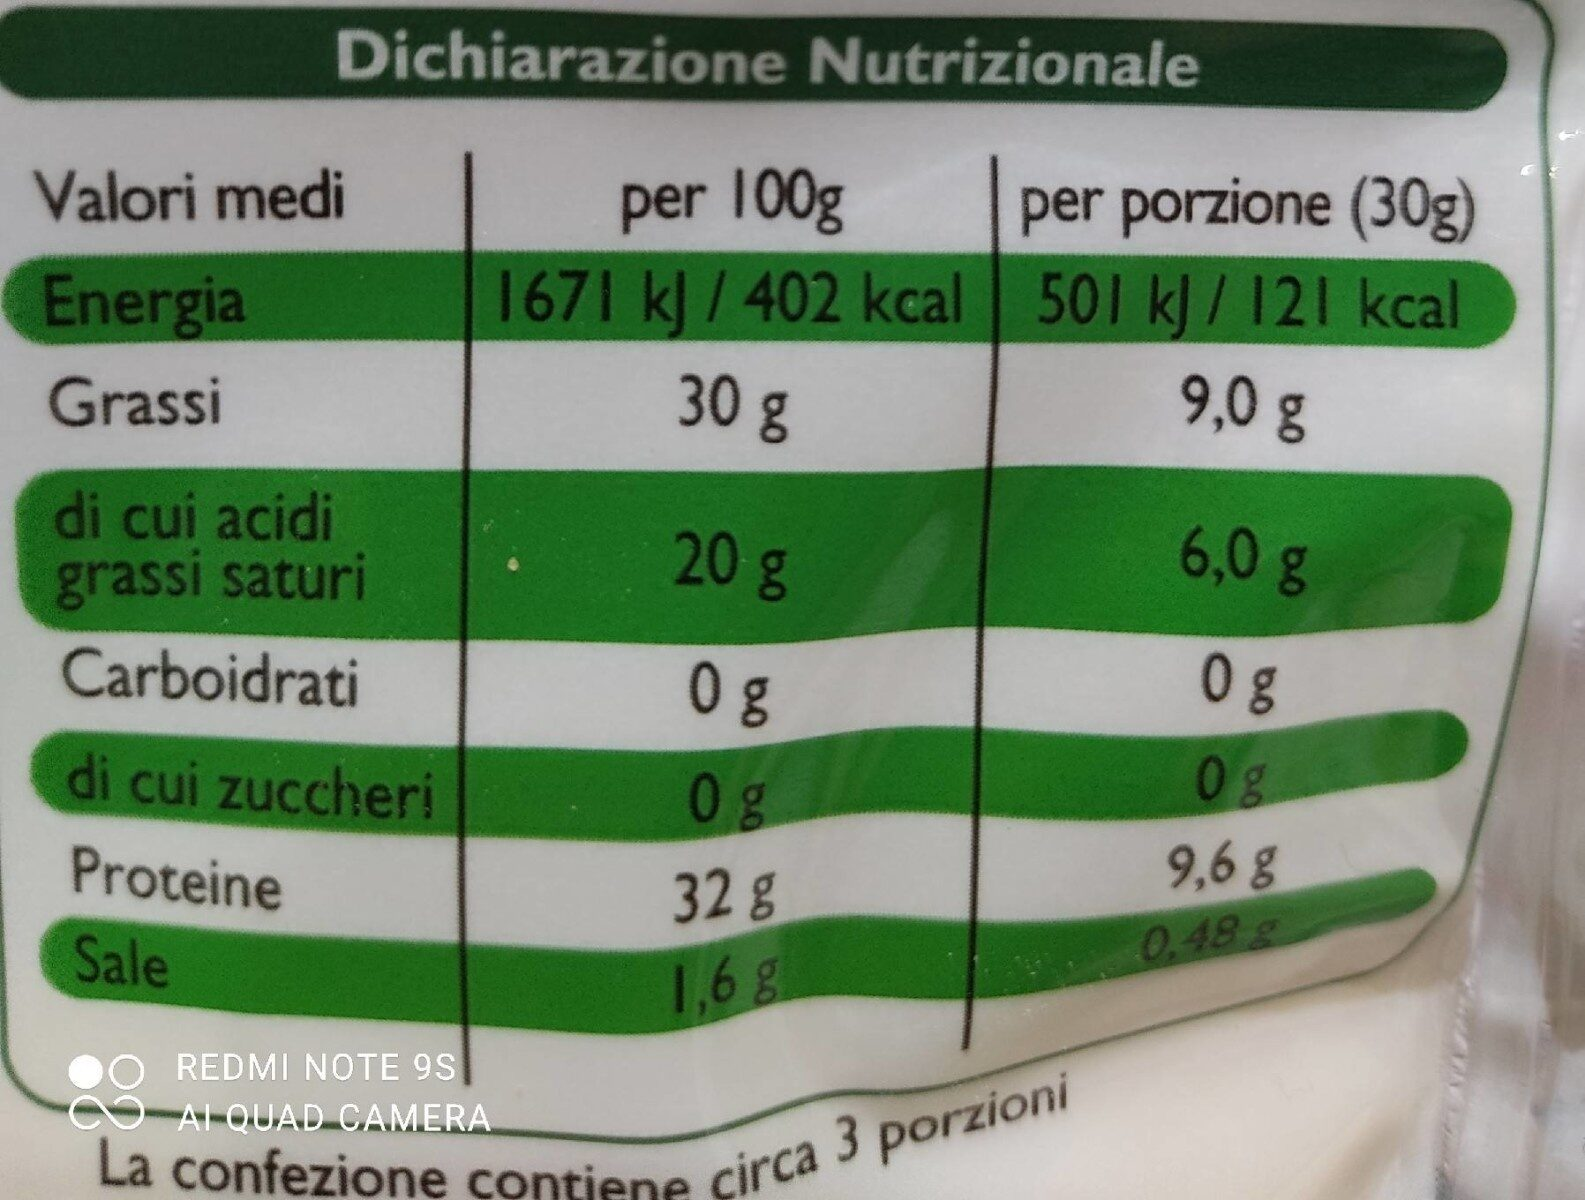 Parmigiano Reggiano DOP grattugiato - Valori nutrizionali - it